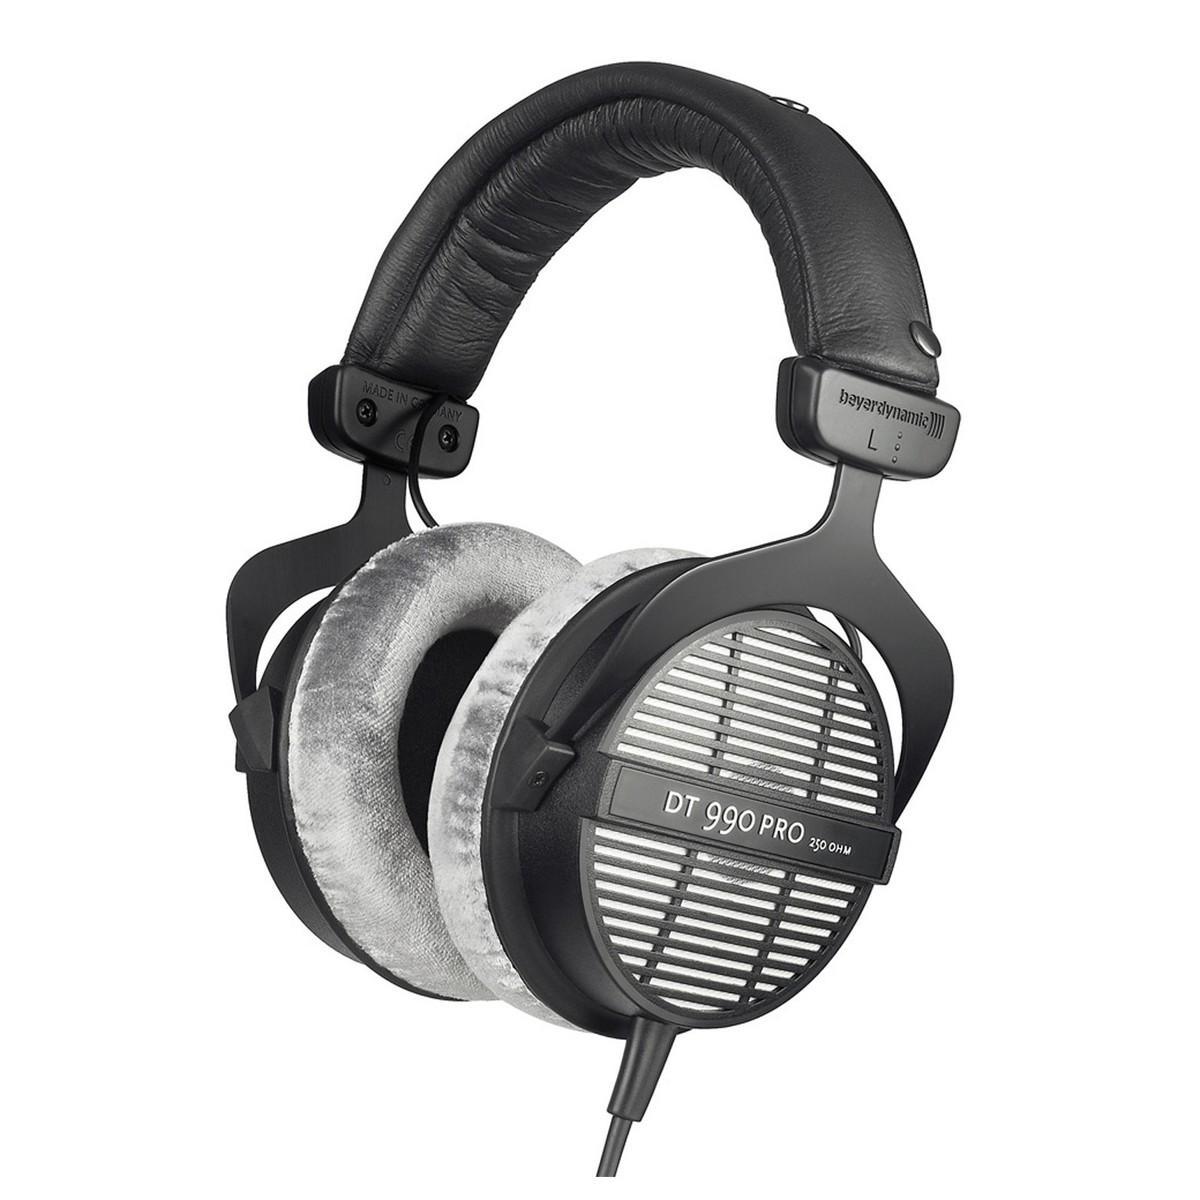 beyerdynamic dt 990 pro headphones 250 ohm b stock at gear4music. Black Bedroom Furniture Sets. Home Design Ideas